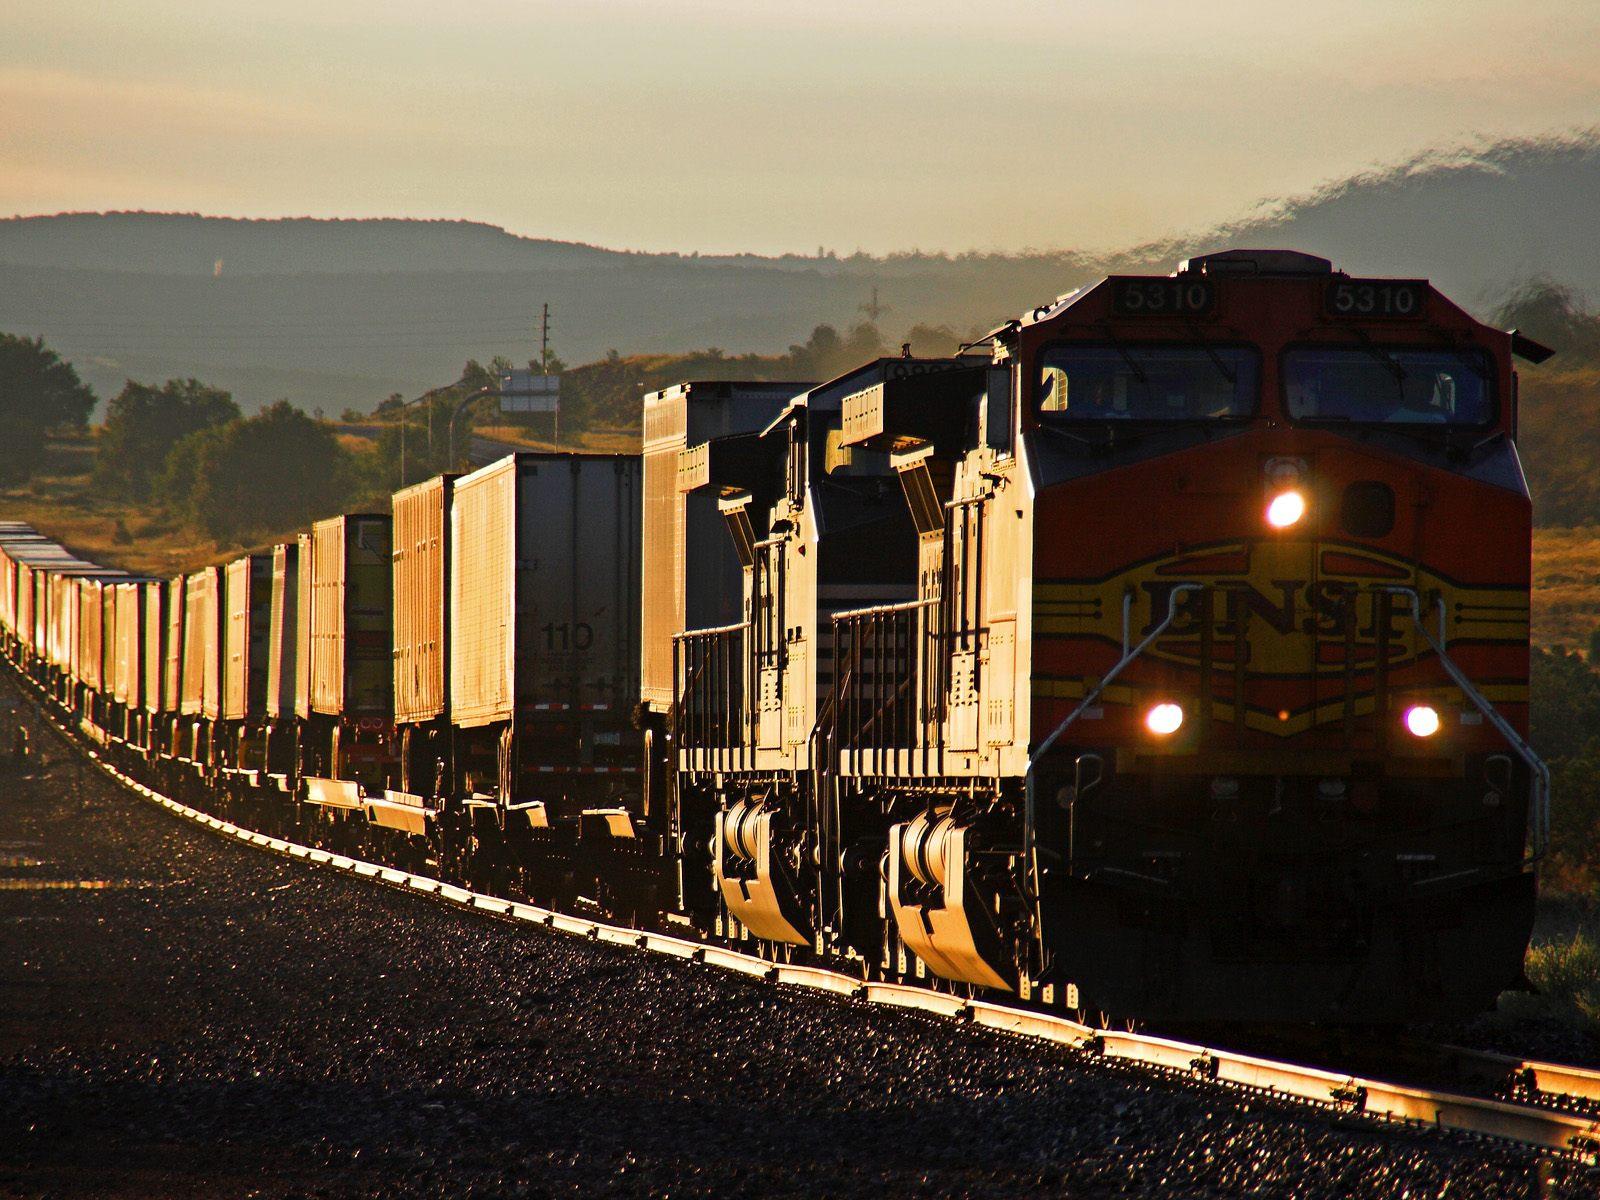 train2 image